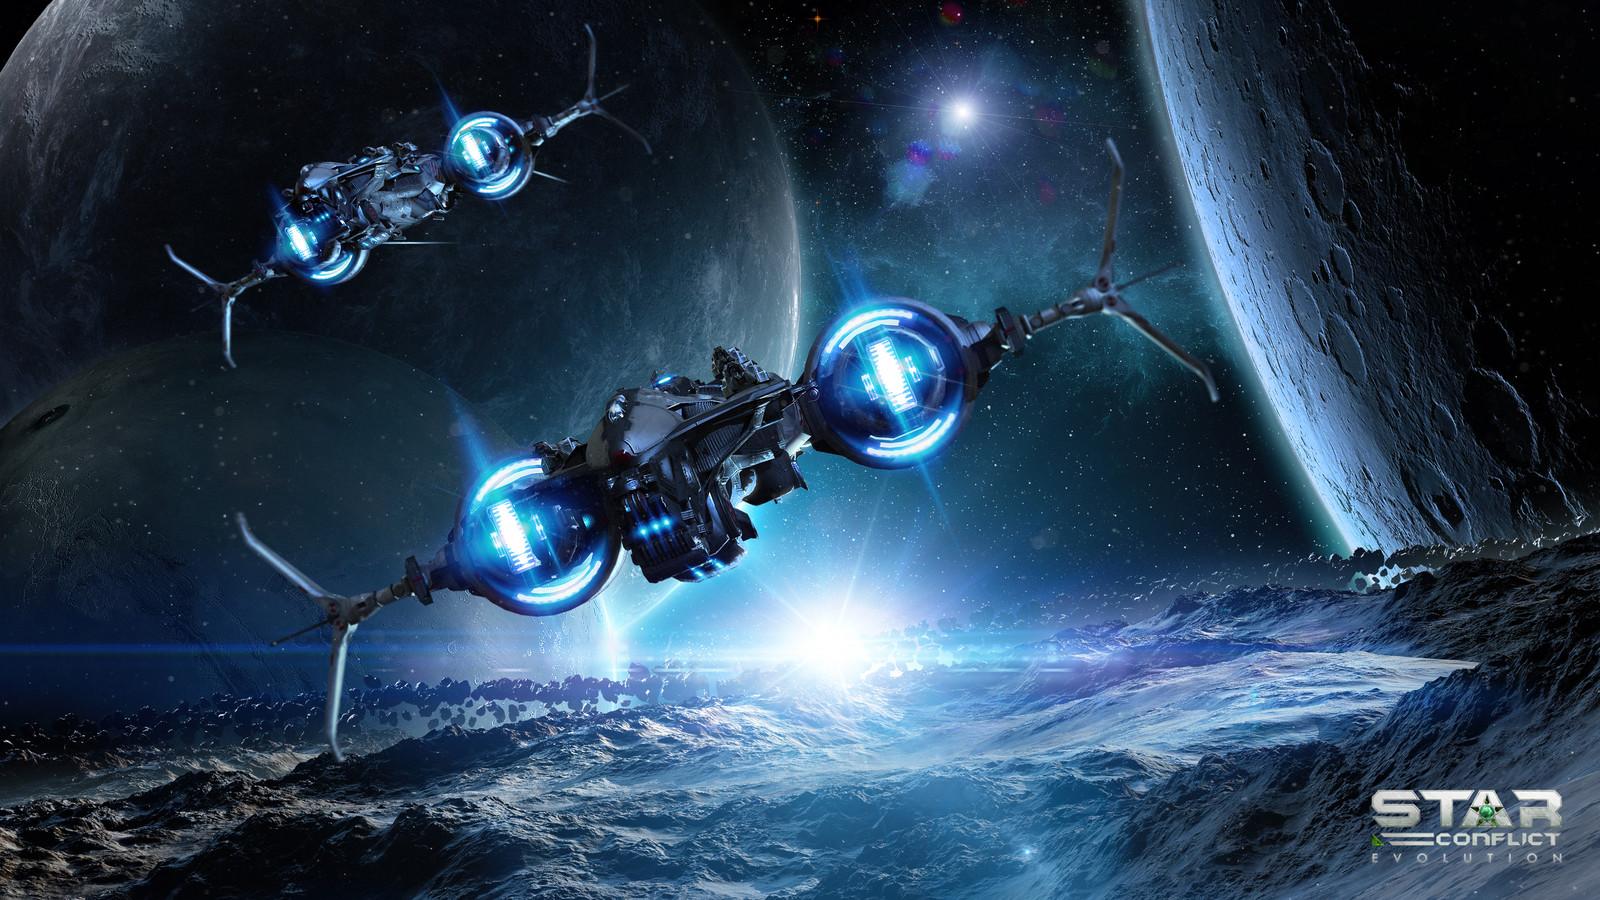 Star Conflict-Best Steam Games